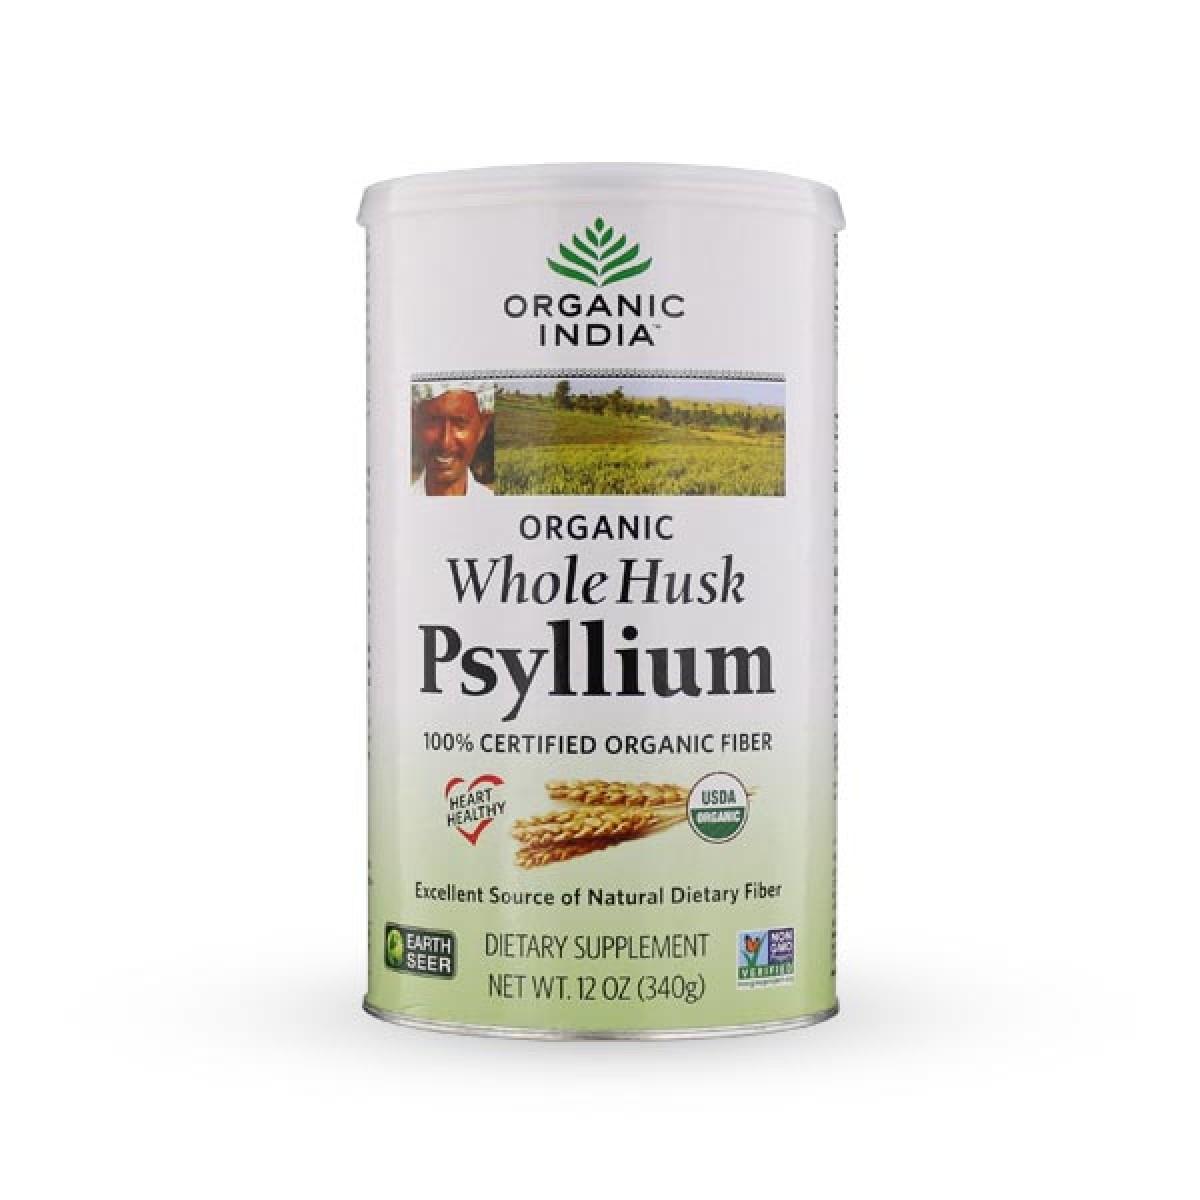 organic india whole husk psyllium reviews